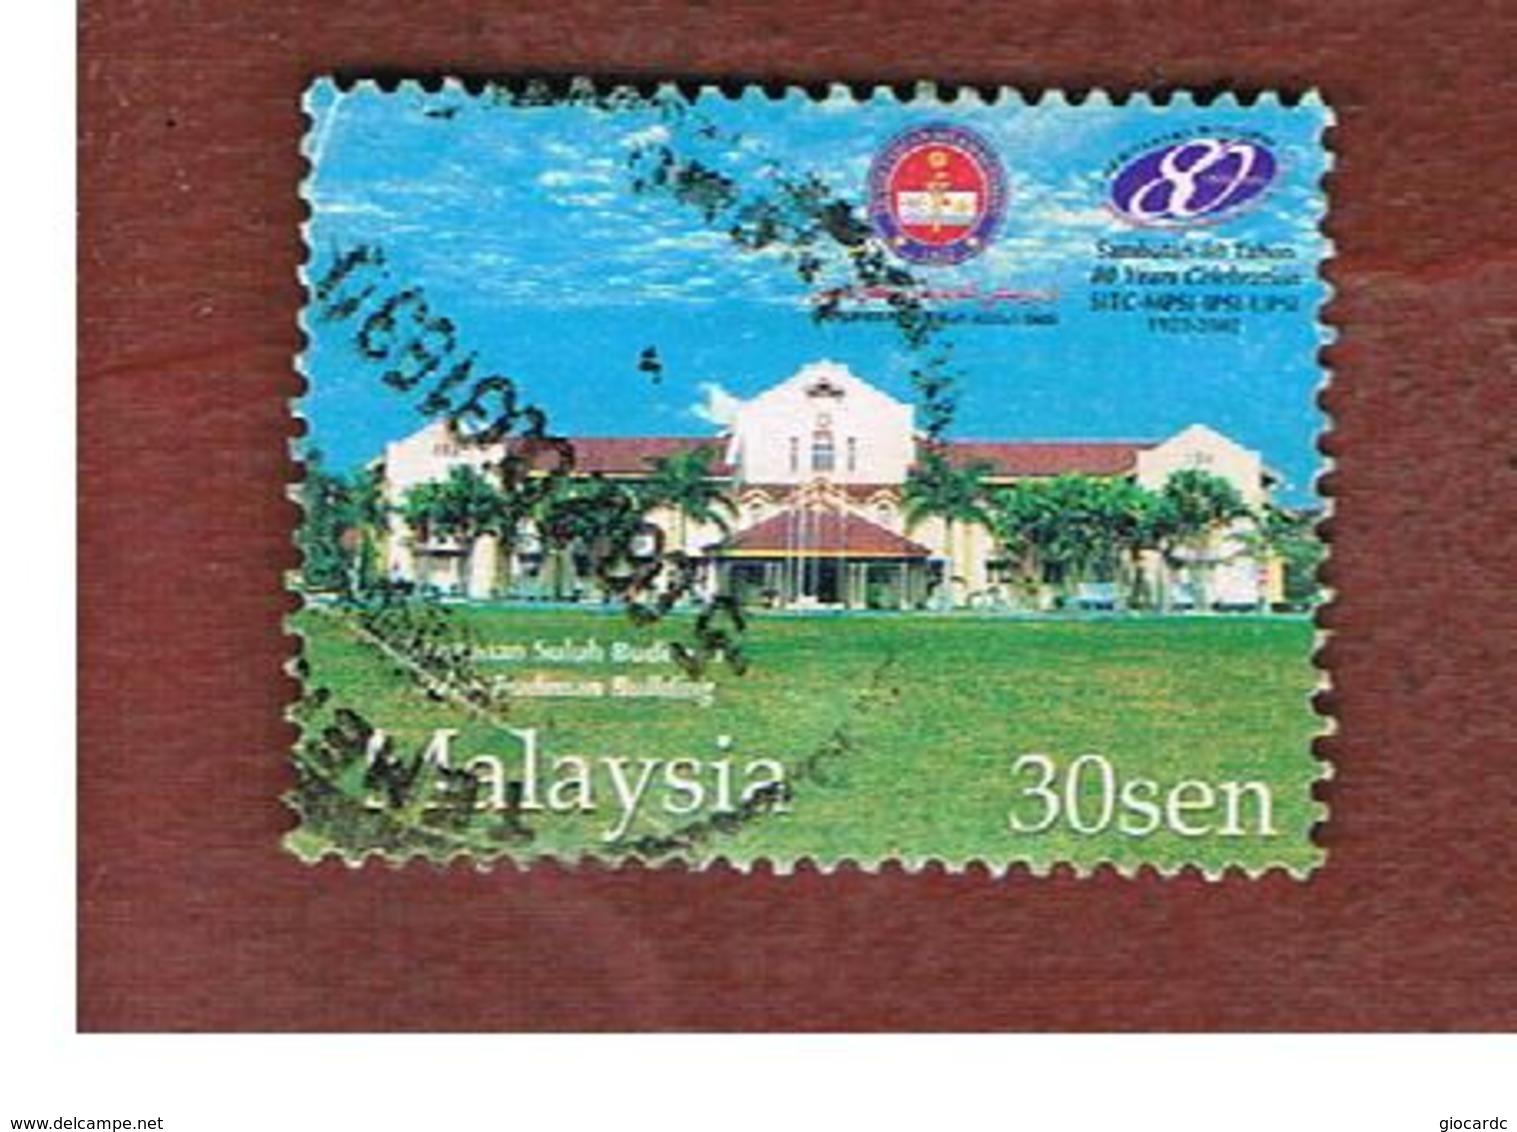 MALESIA (MALAYSIA)  -  SG 1100  -   2002  SULTAN IDRIS UNIVERSITY  -  USED ° - Malesia (1964-...)